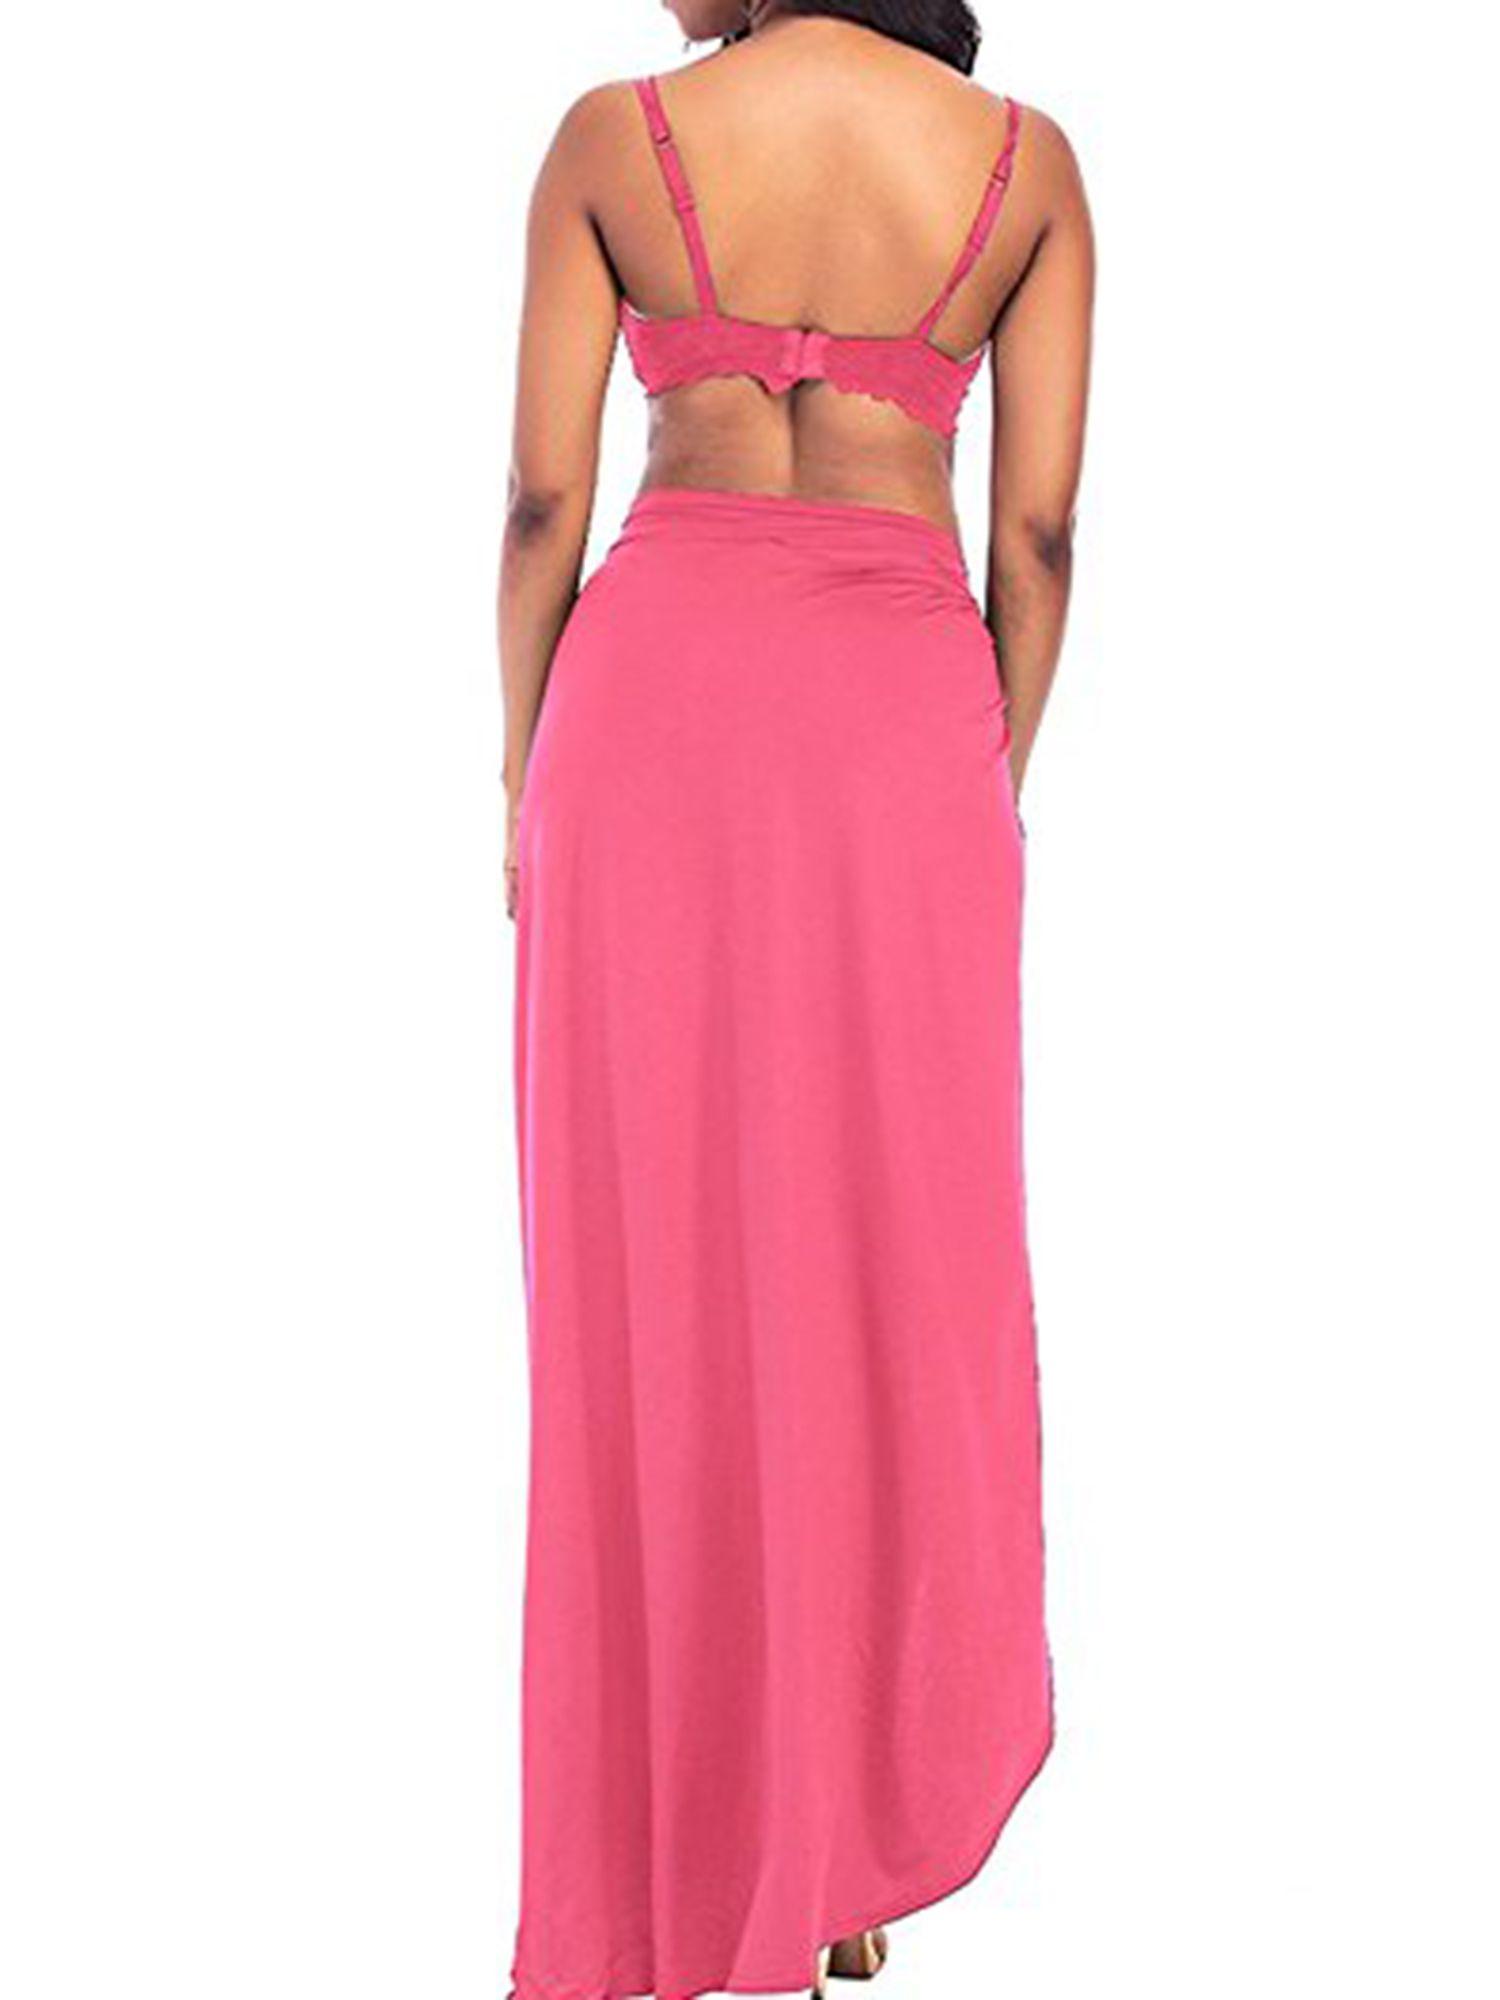 fac31d141b03f Plus Size Women's Spaghetti Strap Beach Dresses Cover Up Bikini Cover Up  Wrap Swimsuit V-Neckline Backless Long Dress#Beach, #Dresses, #Cover